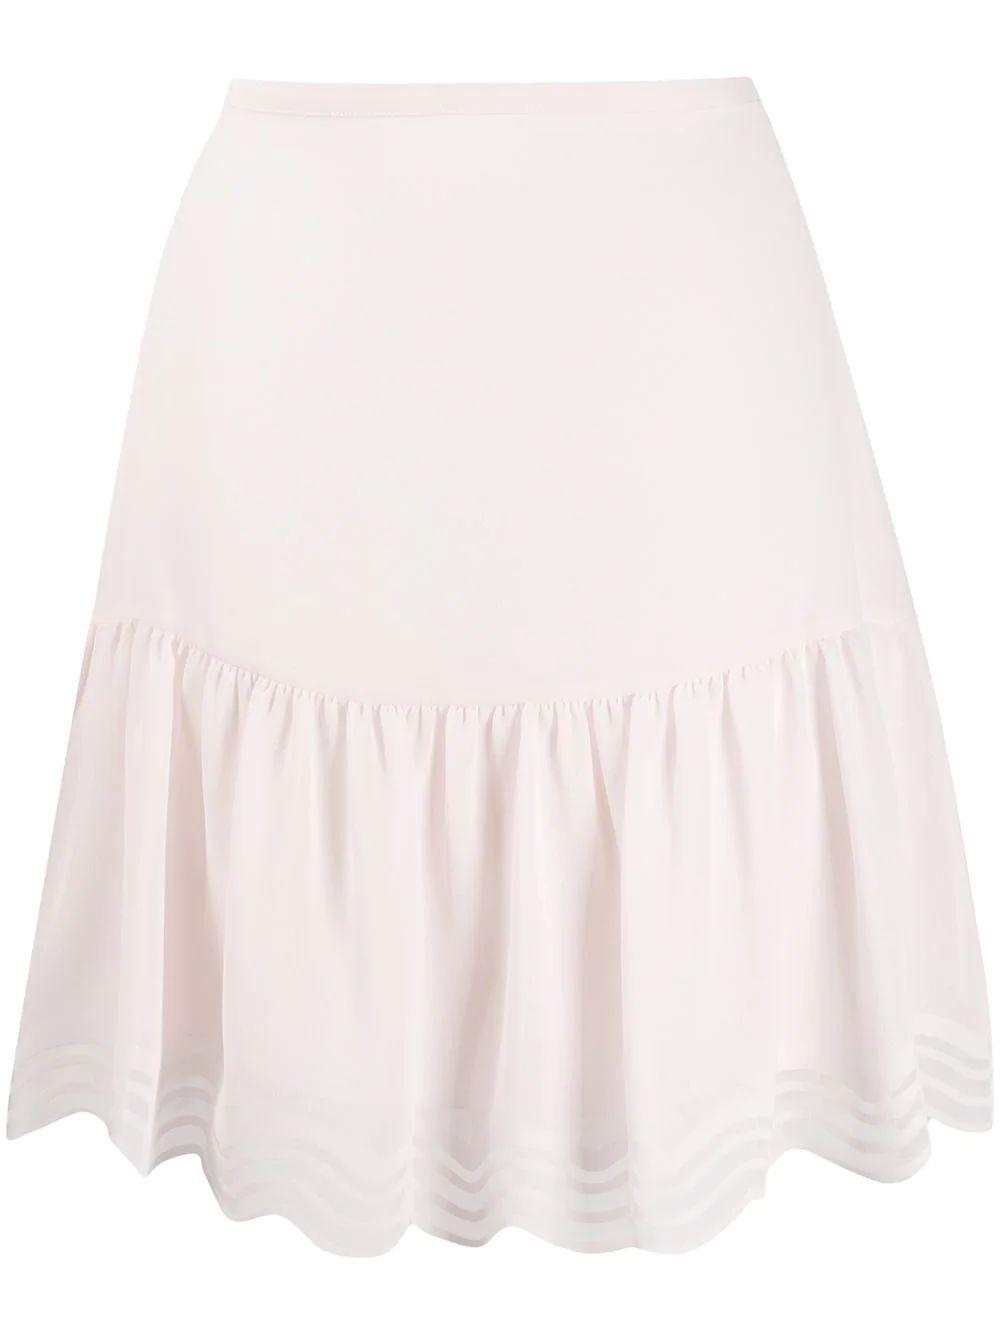 Laser Cut Georgette Skirt